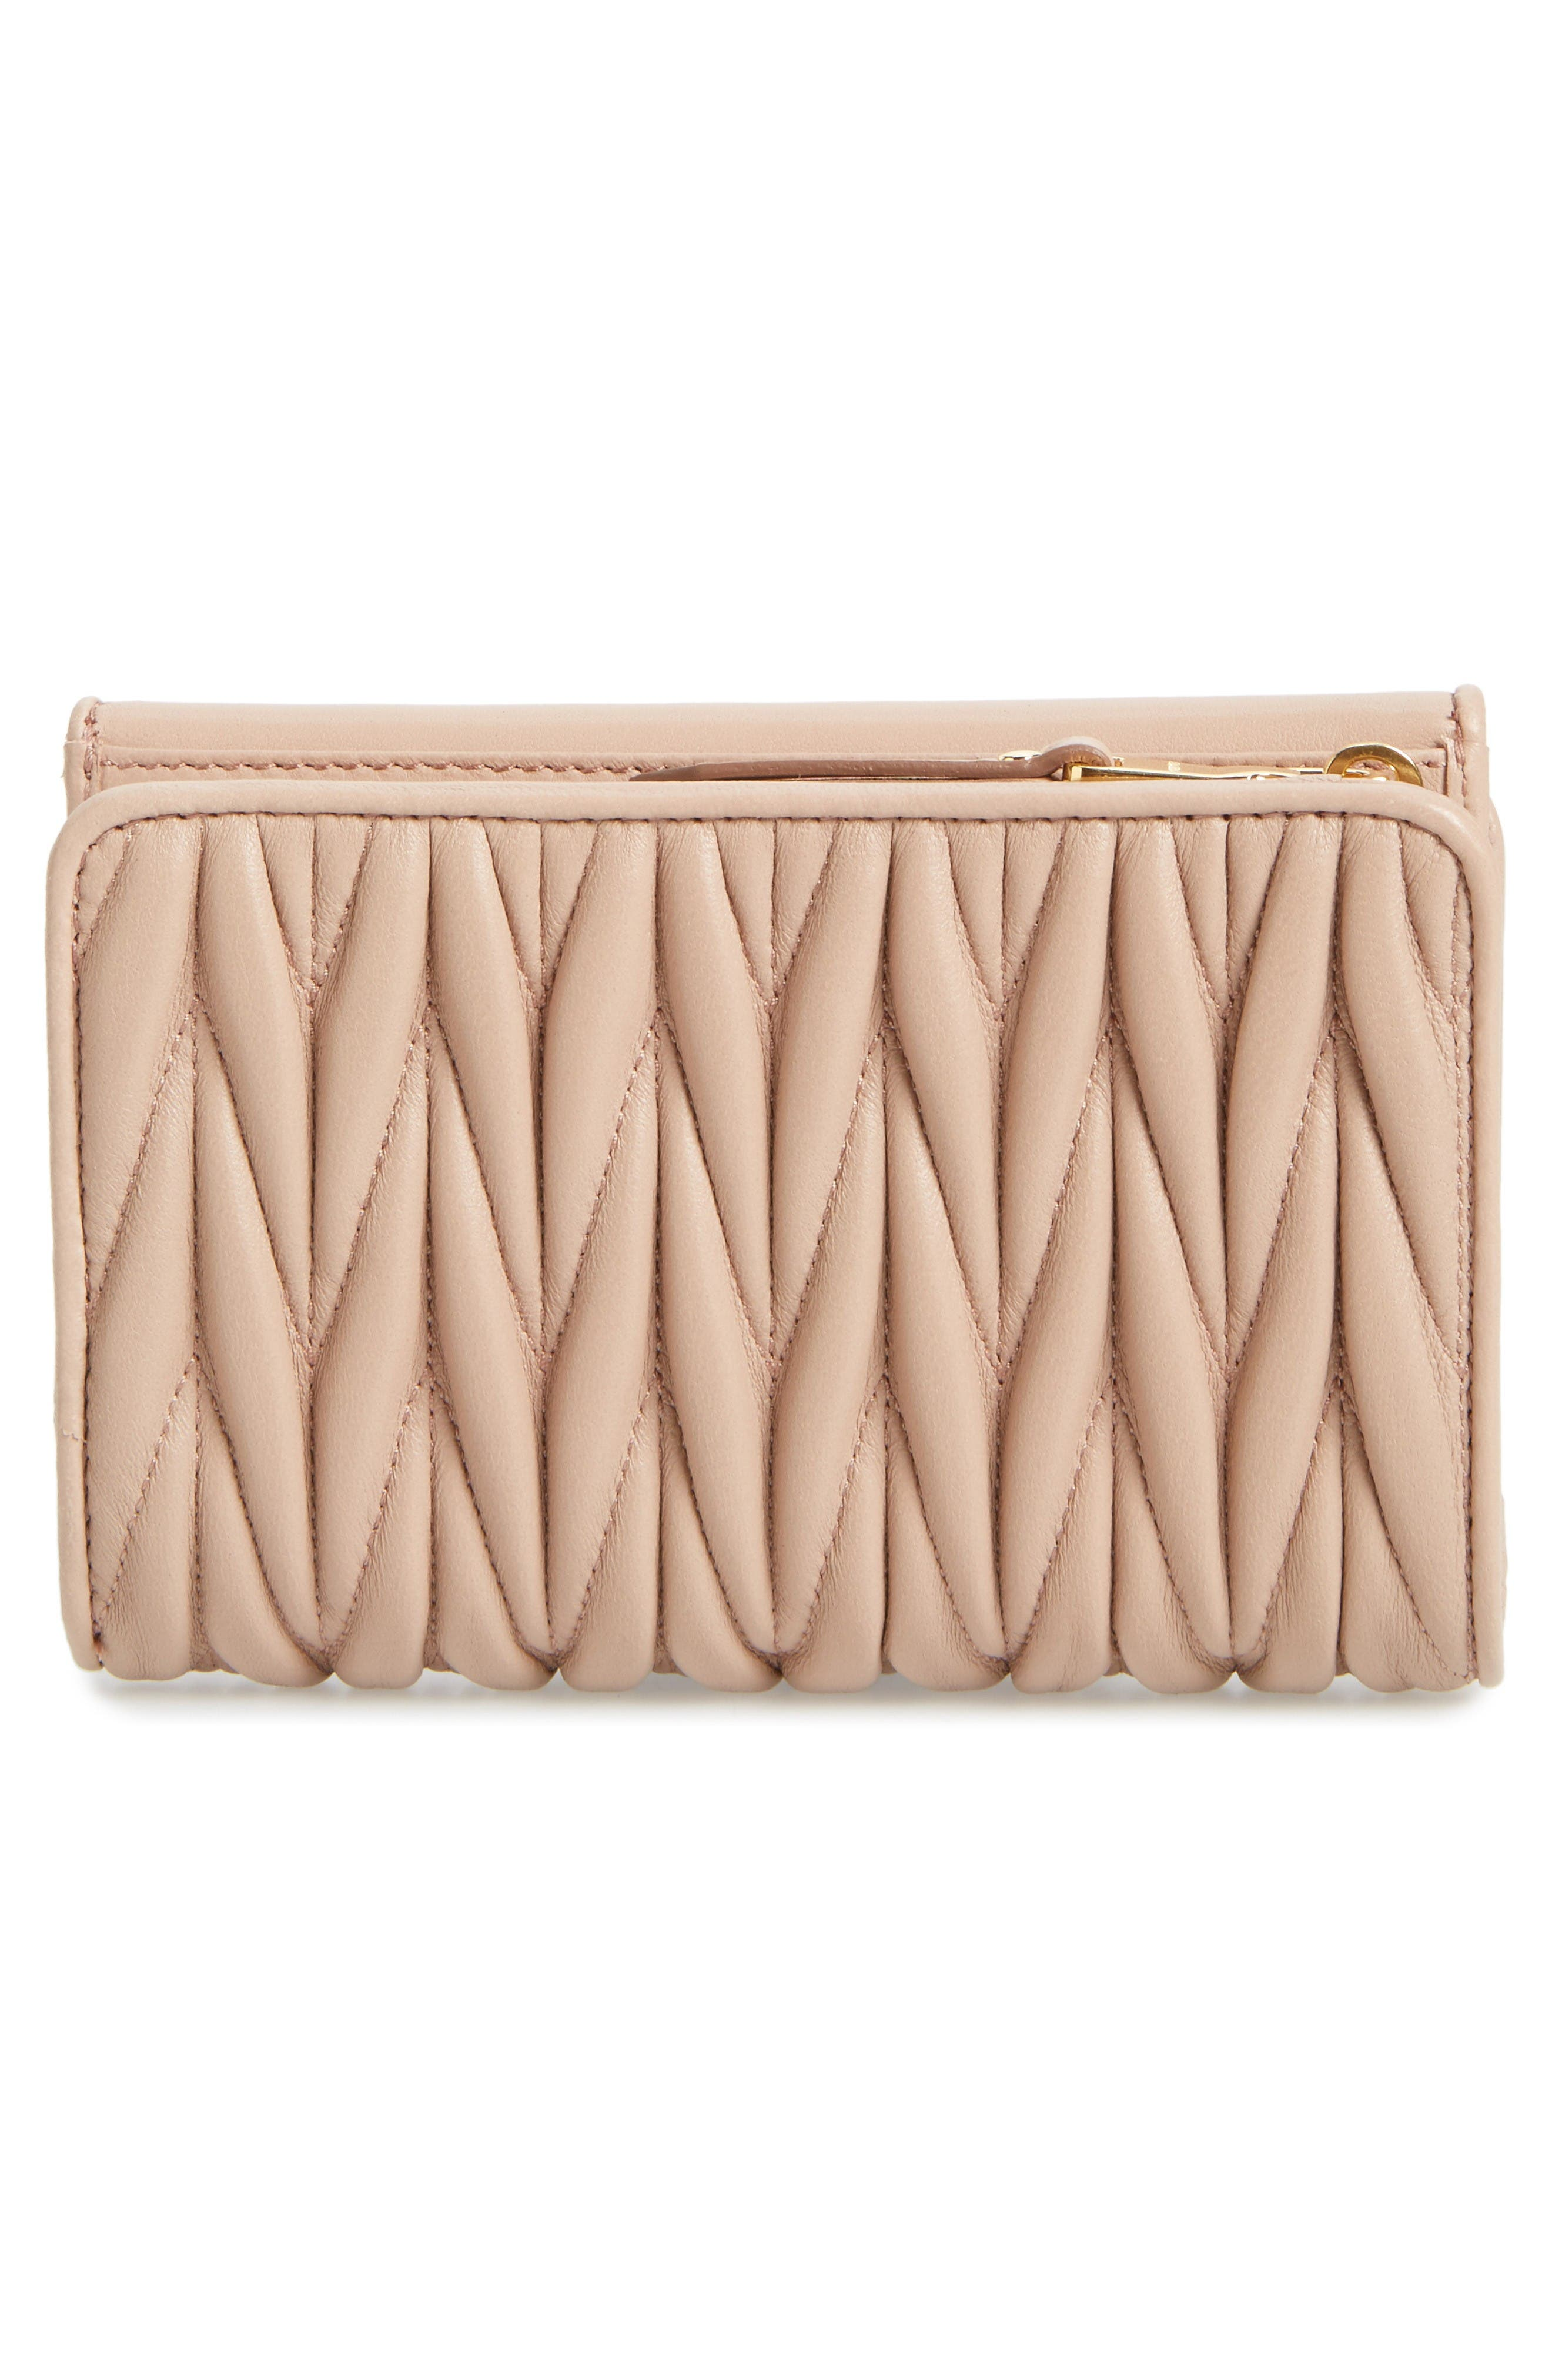 Alternate Image 3  - Miu Miu Matelassé Leather French Wallet